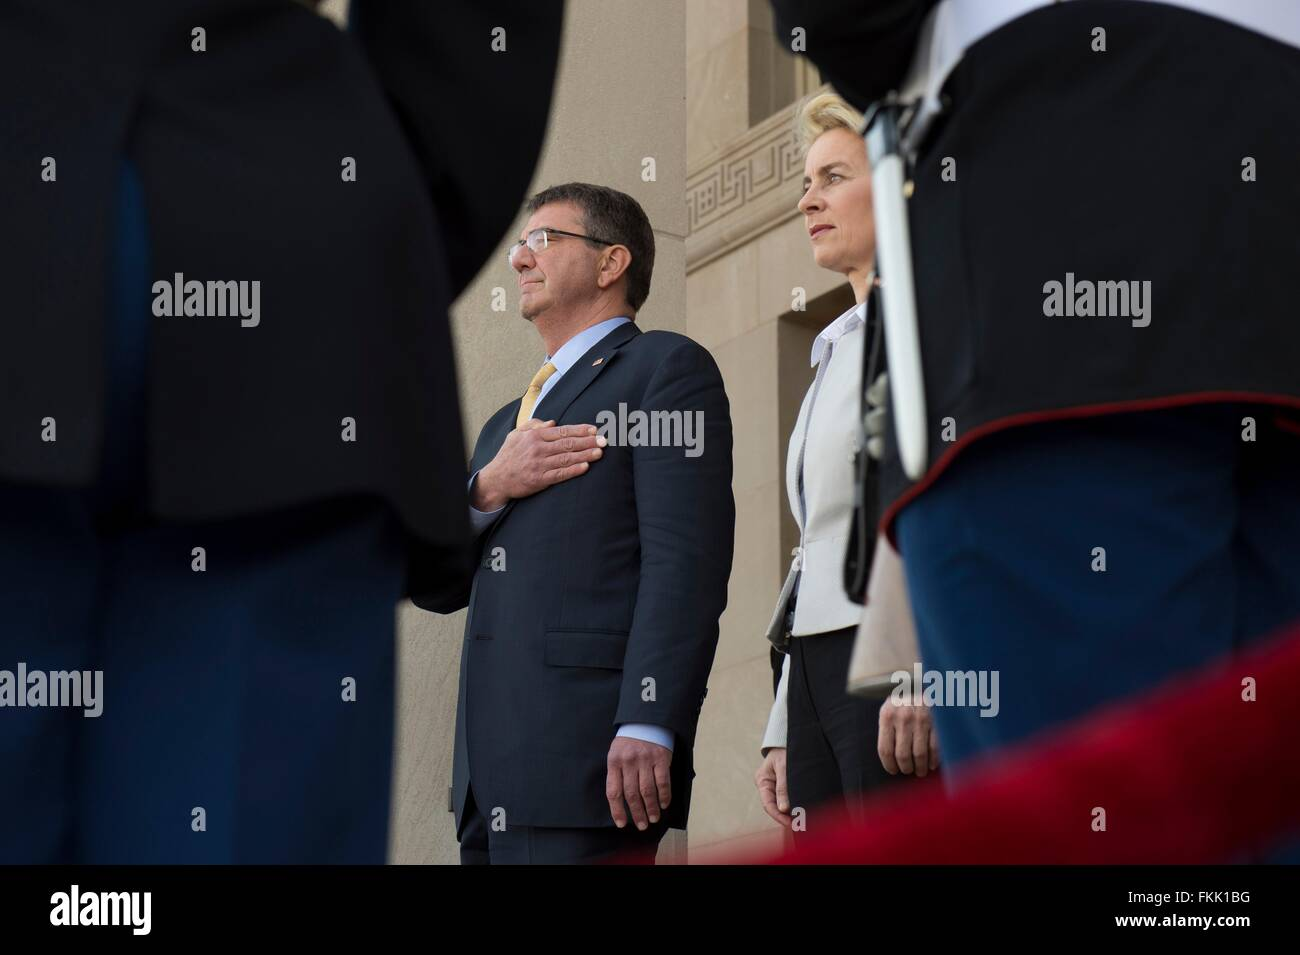 U.S Secretary of Defense Ash Carter and German Minister of Defence Ursula von der Leyen during arrival ceremonies - Stock Image